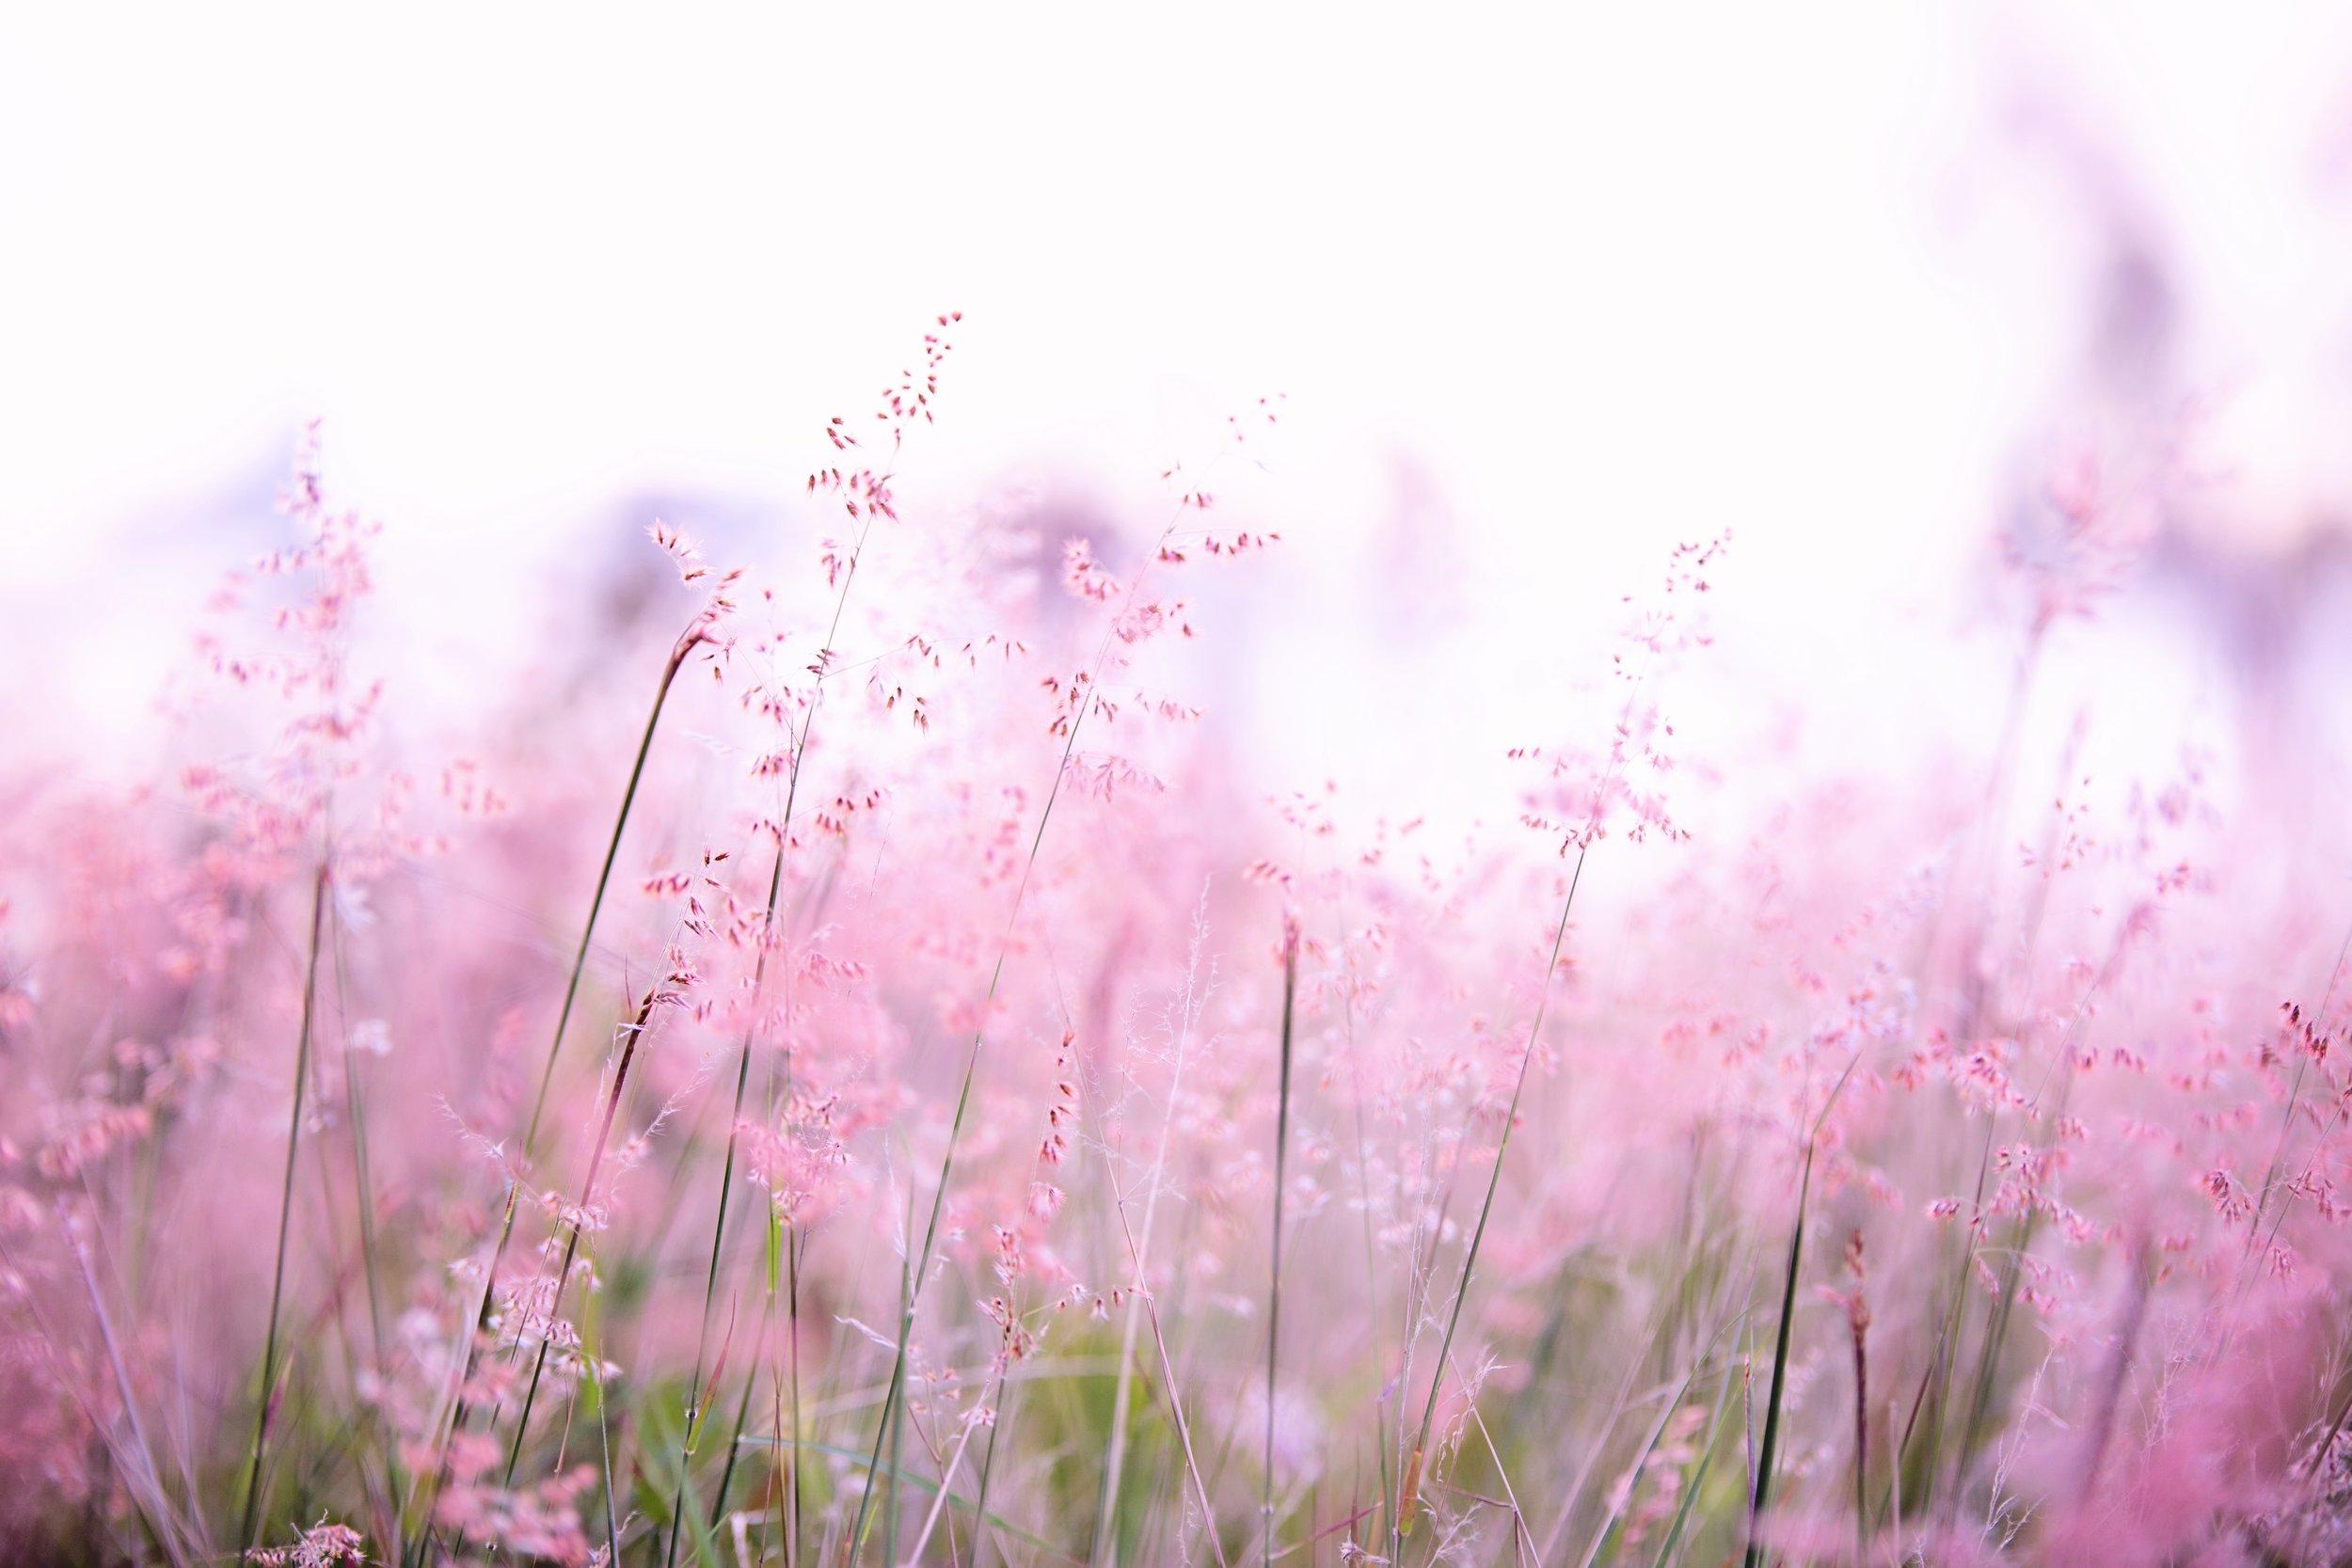 blur-color-depth-of-field-1128797.jpg